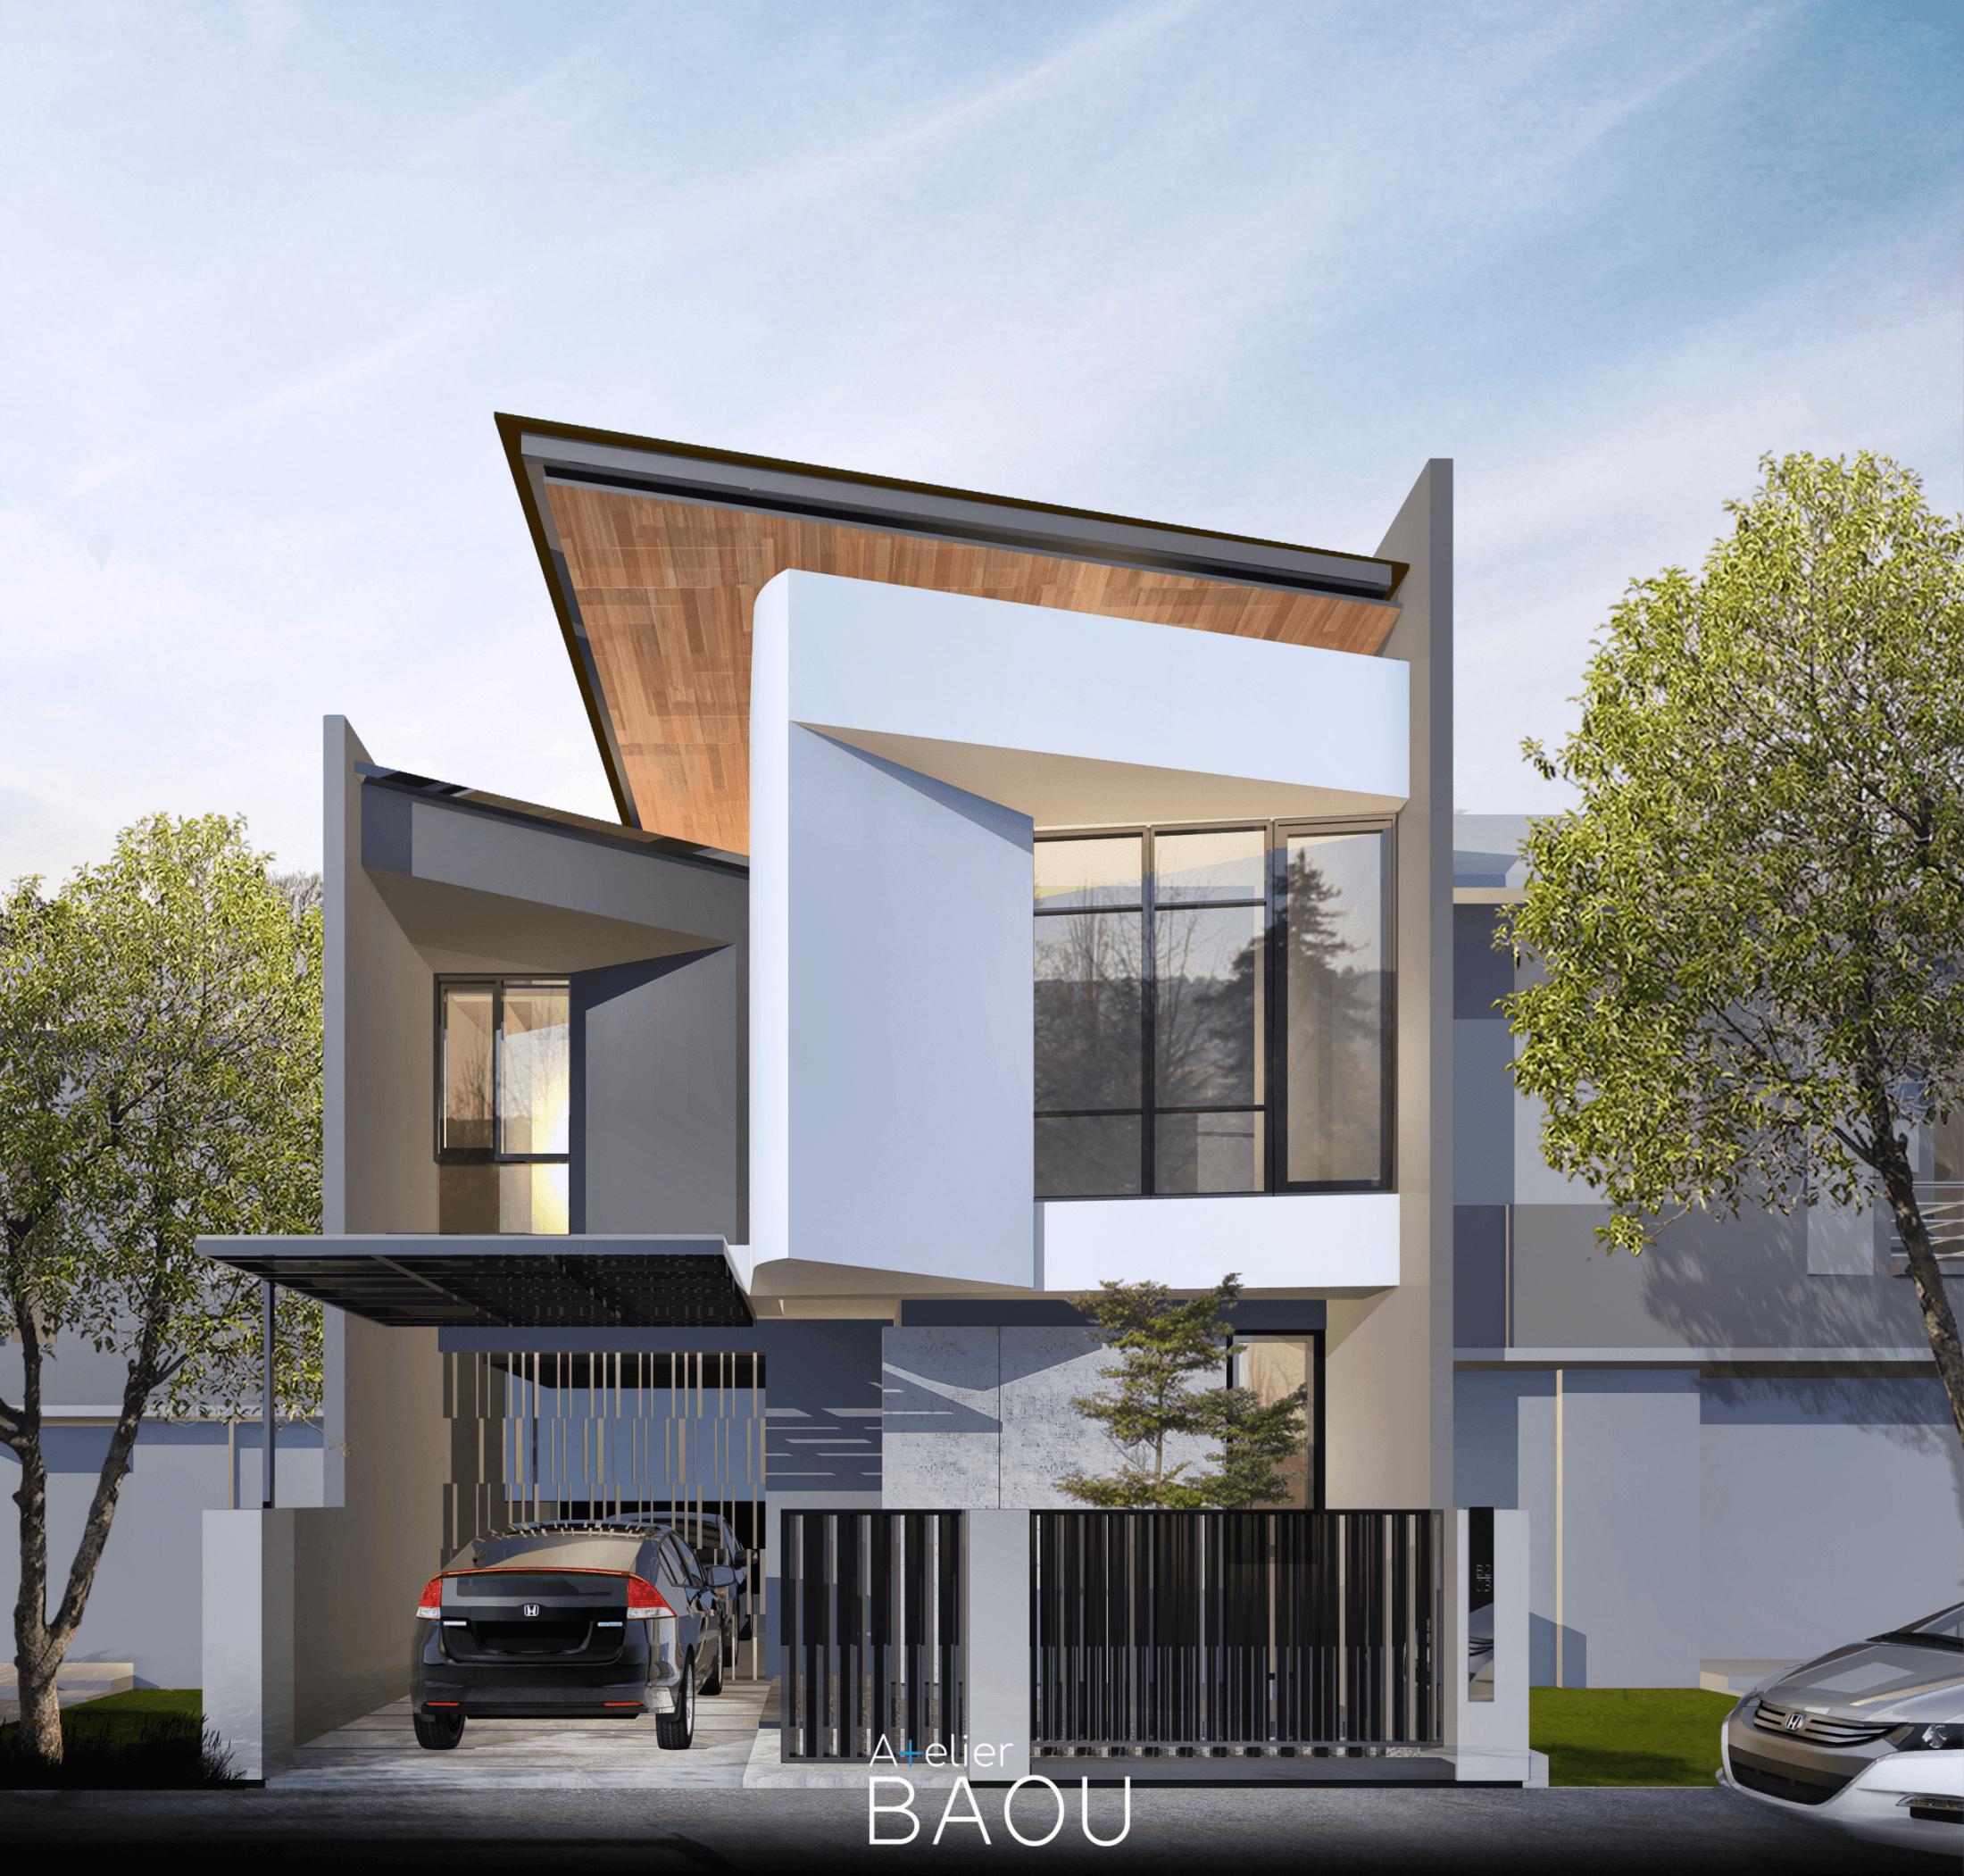 Atelier Baou Hd House Kota Depok, Jawa Barat, Indonesia Kota Depok, Jawa Barat, Indonesia Atelier-Baou-Hd-House  86477